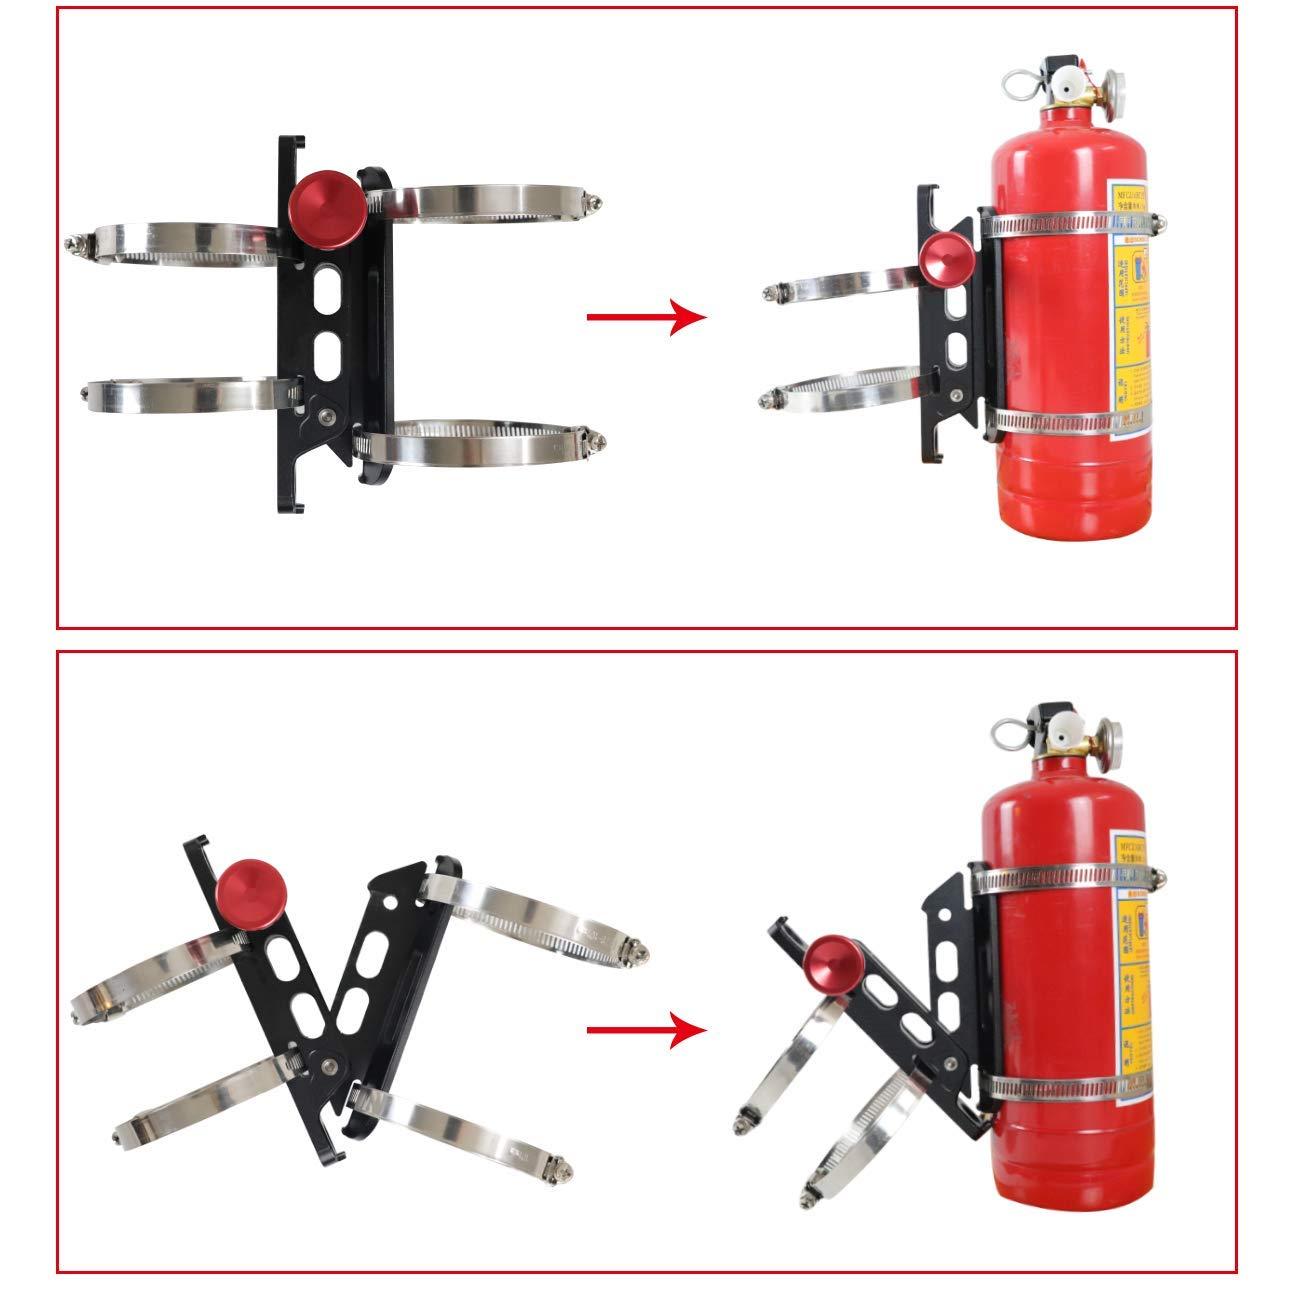 AUFER Quick Release Aluminum Adjustable Roll Bar Fire Extinguisher Mount Holder for Jeep Wrangler UTV Polaris RZR Ranger Camper Van with Pillar Support 1-10Lb Extinguishers ,8 Mounting Clamps